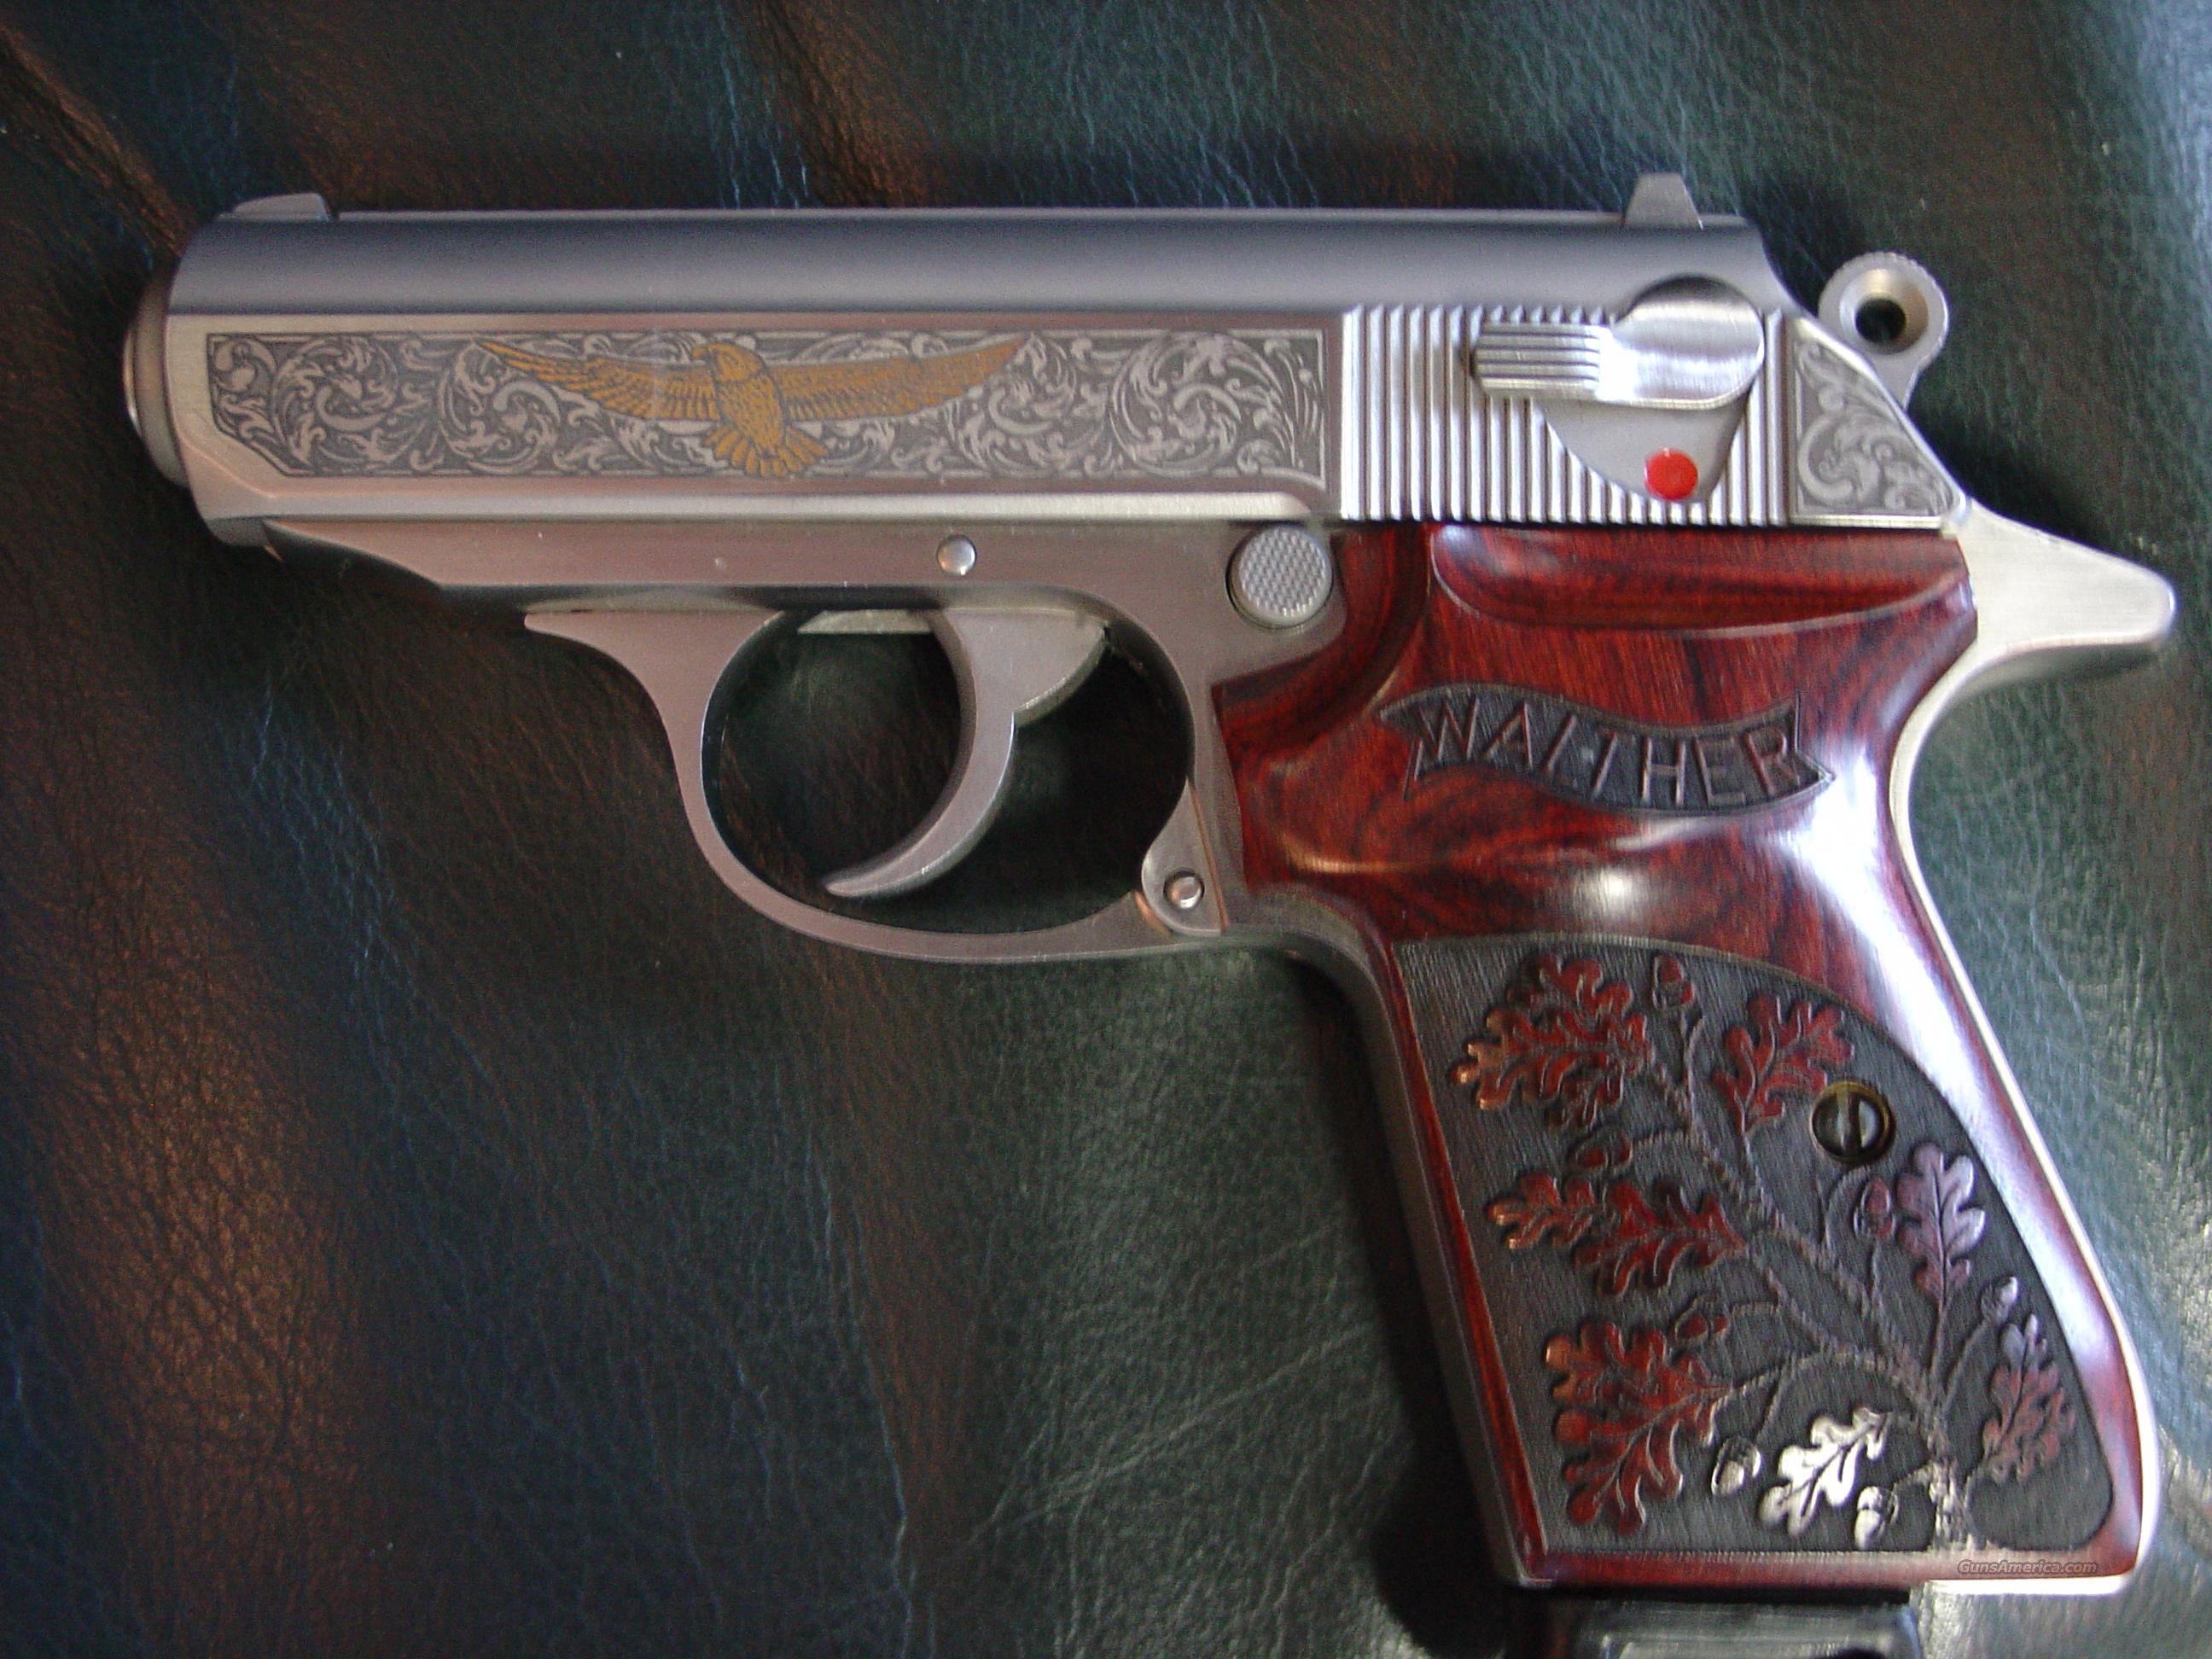 walther ppk s 1 of 400 premier edition engraved for sale rh gunsamerica com